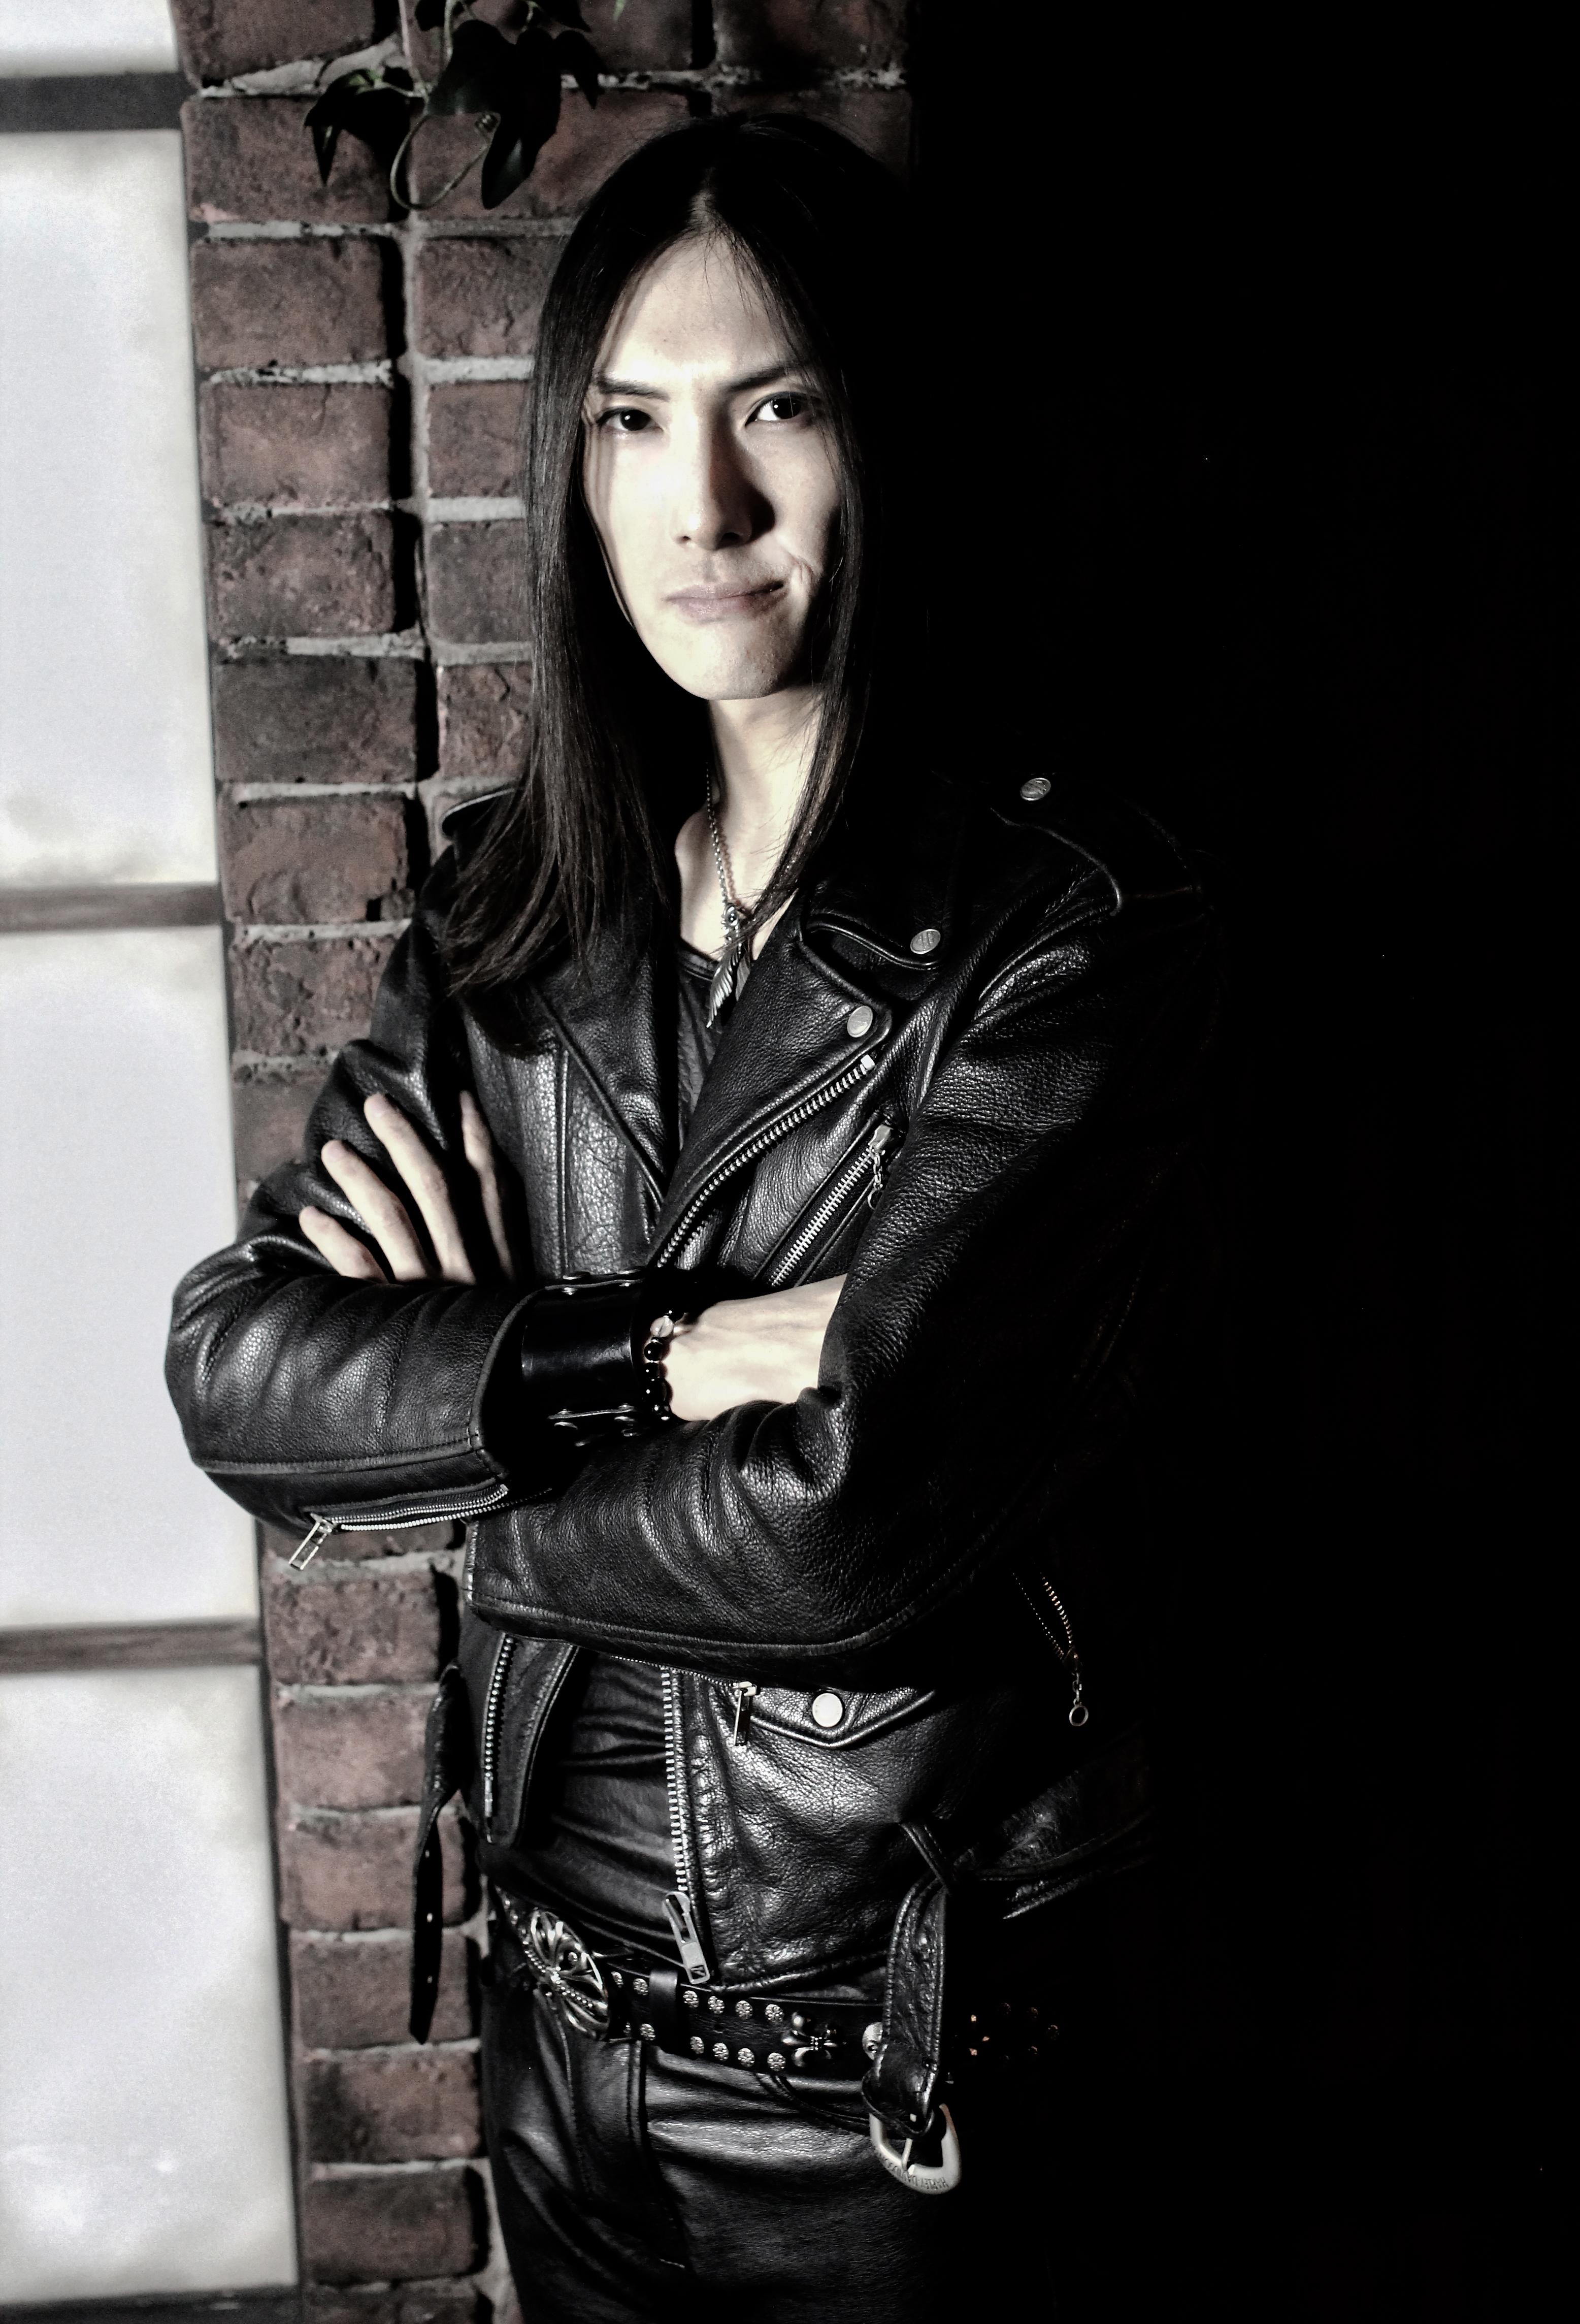 Yosuke (Drums)